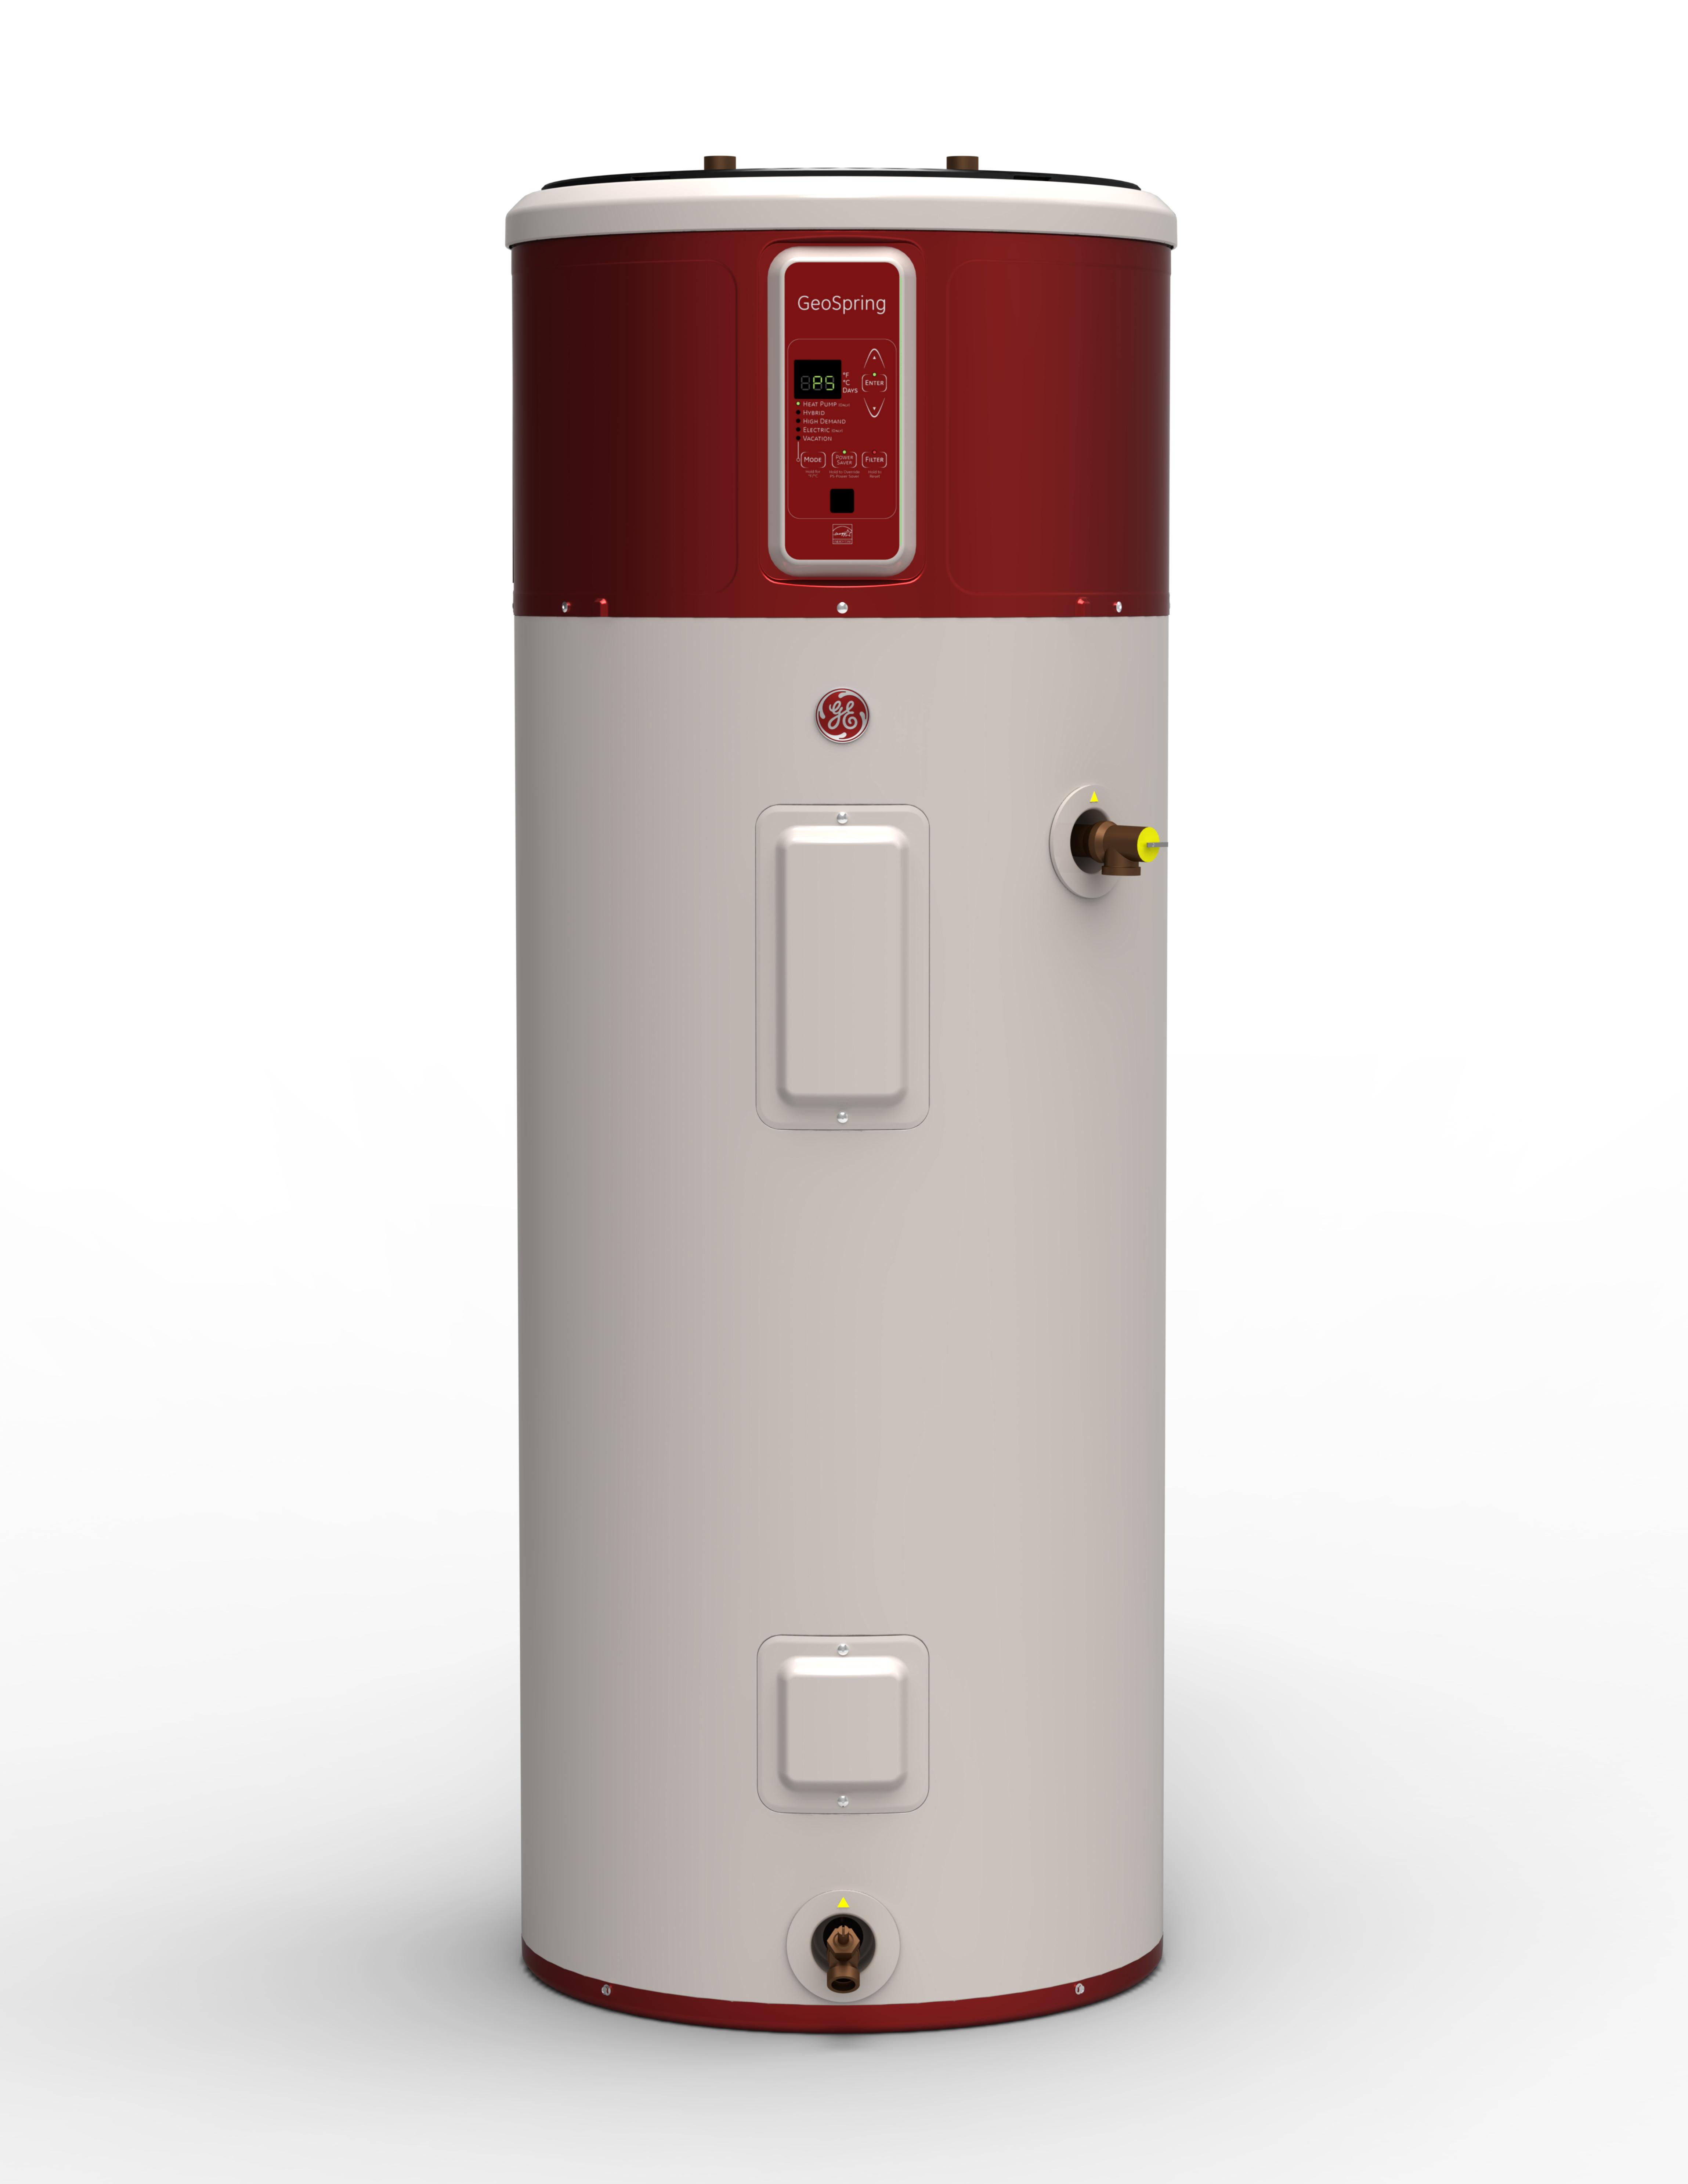 Smart Water Heater Smart Water Heat And ge